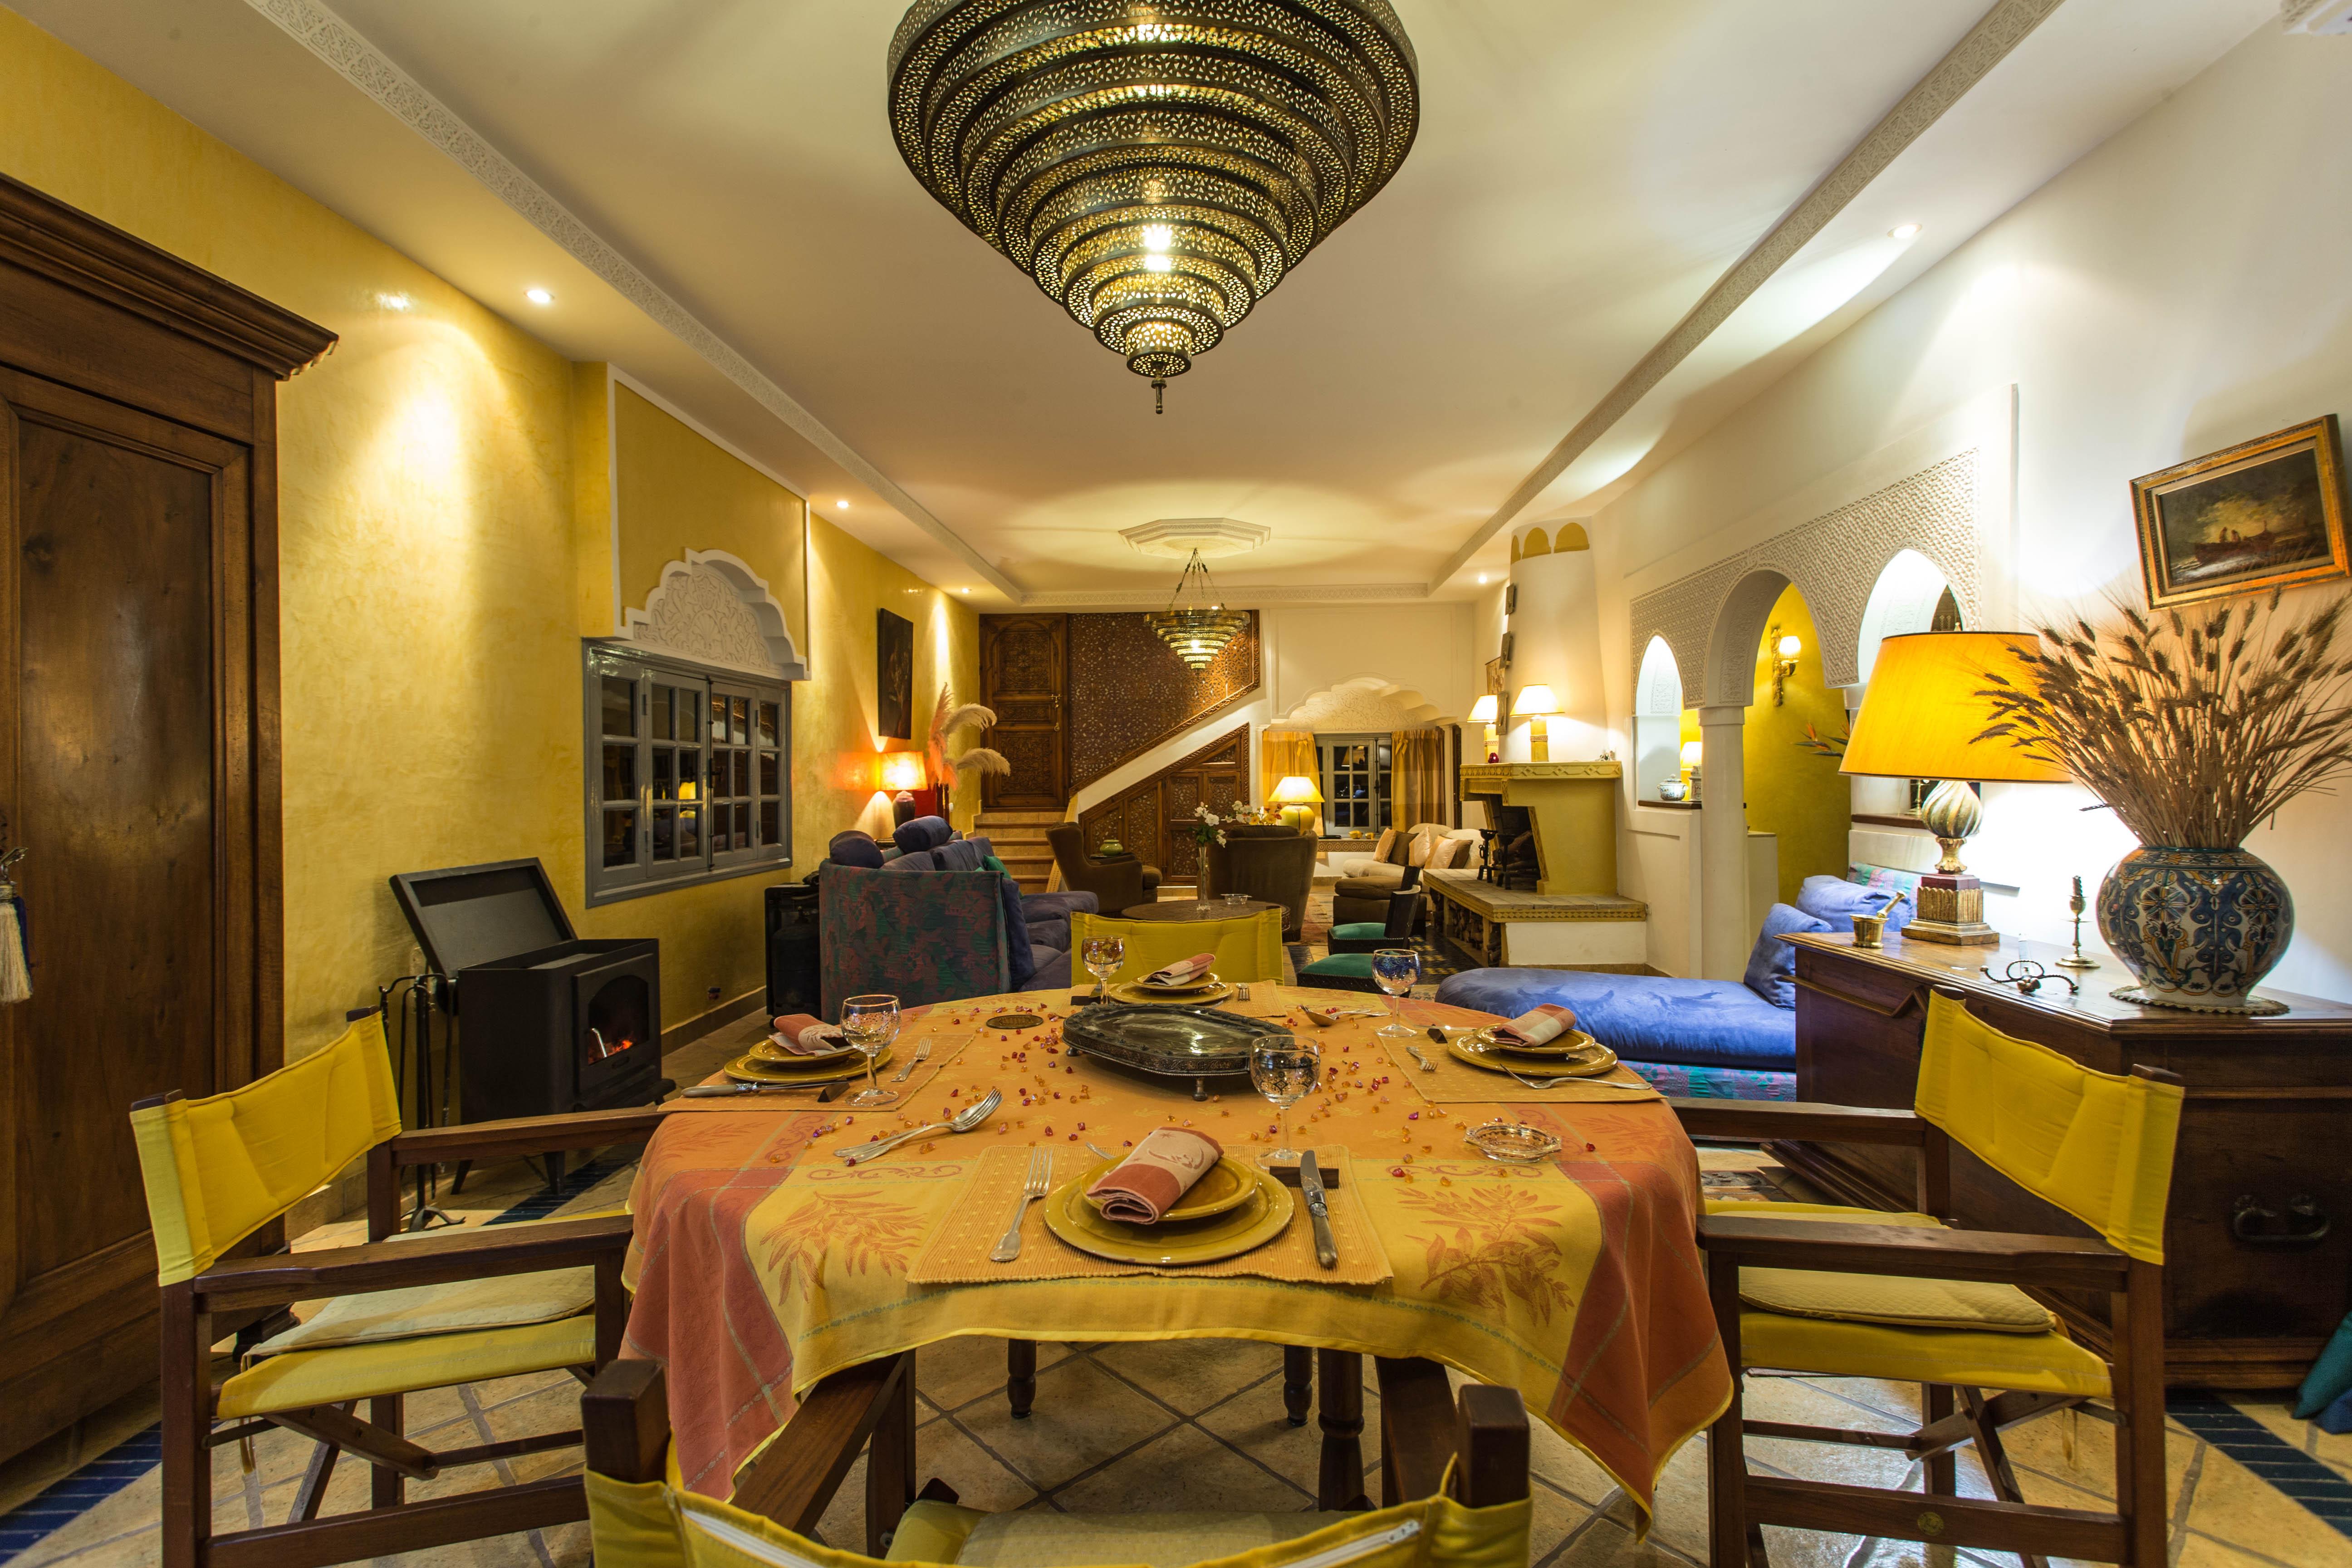 Apartment VILLA LES OLIVIERS - SPLENDIDE VILLA AVEC PISCINE A MARRAKECH photo 20305080